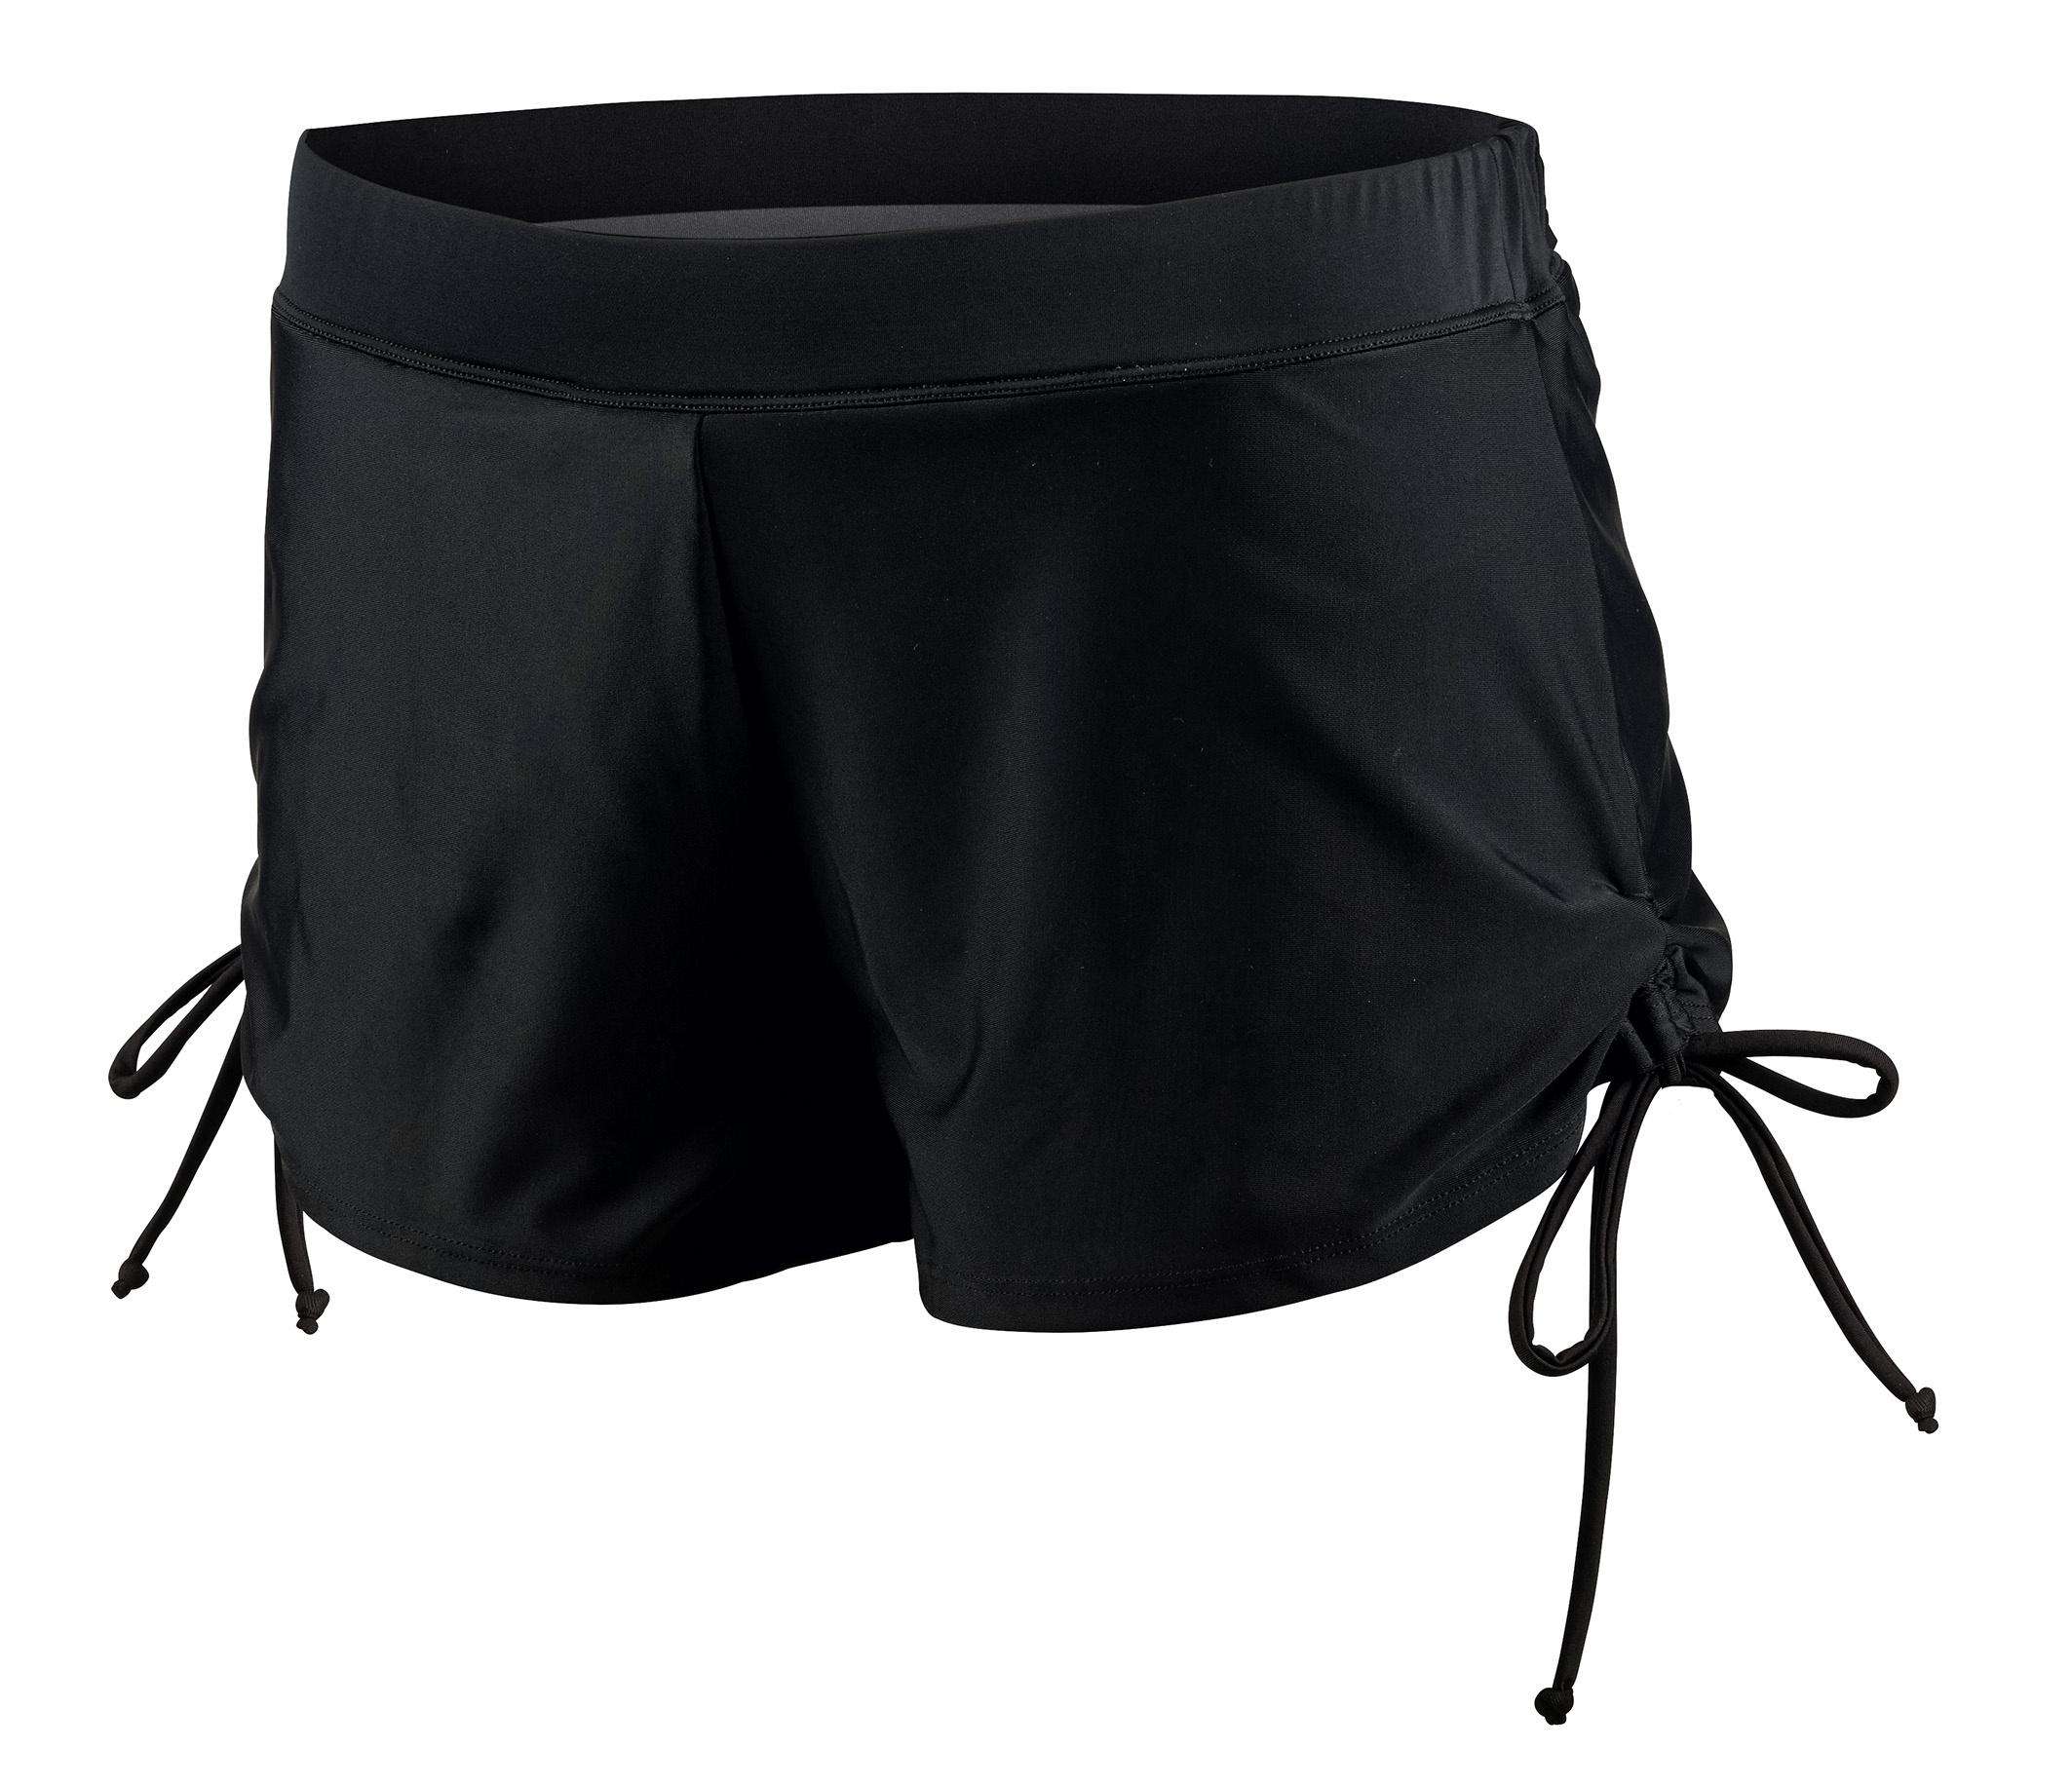 Beco Swim Pant 40